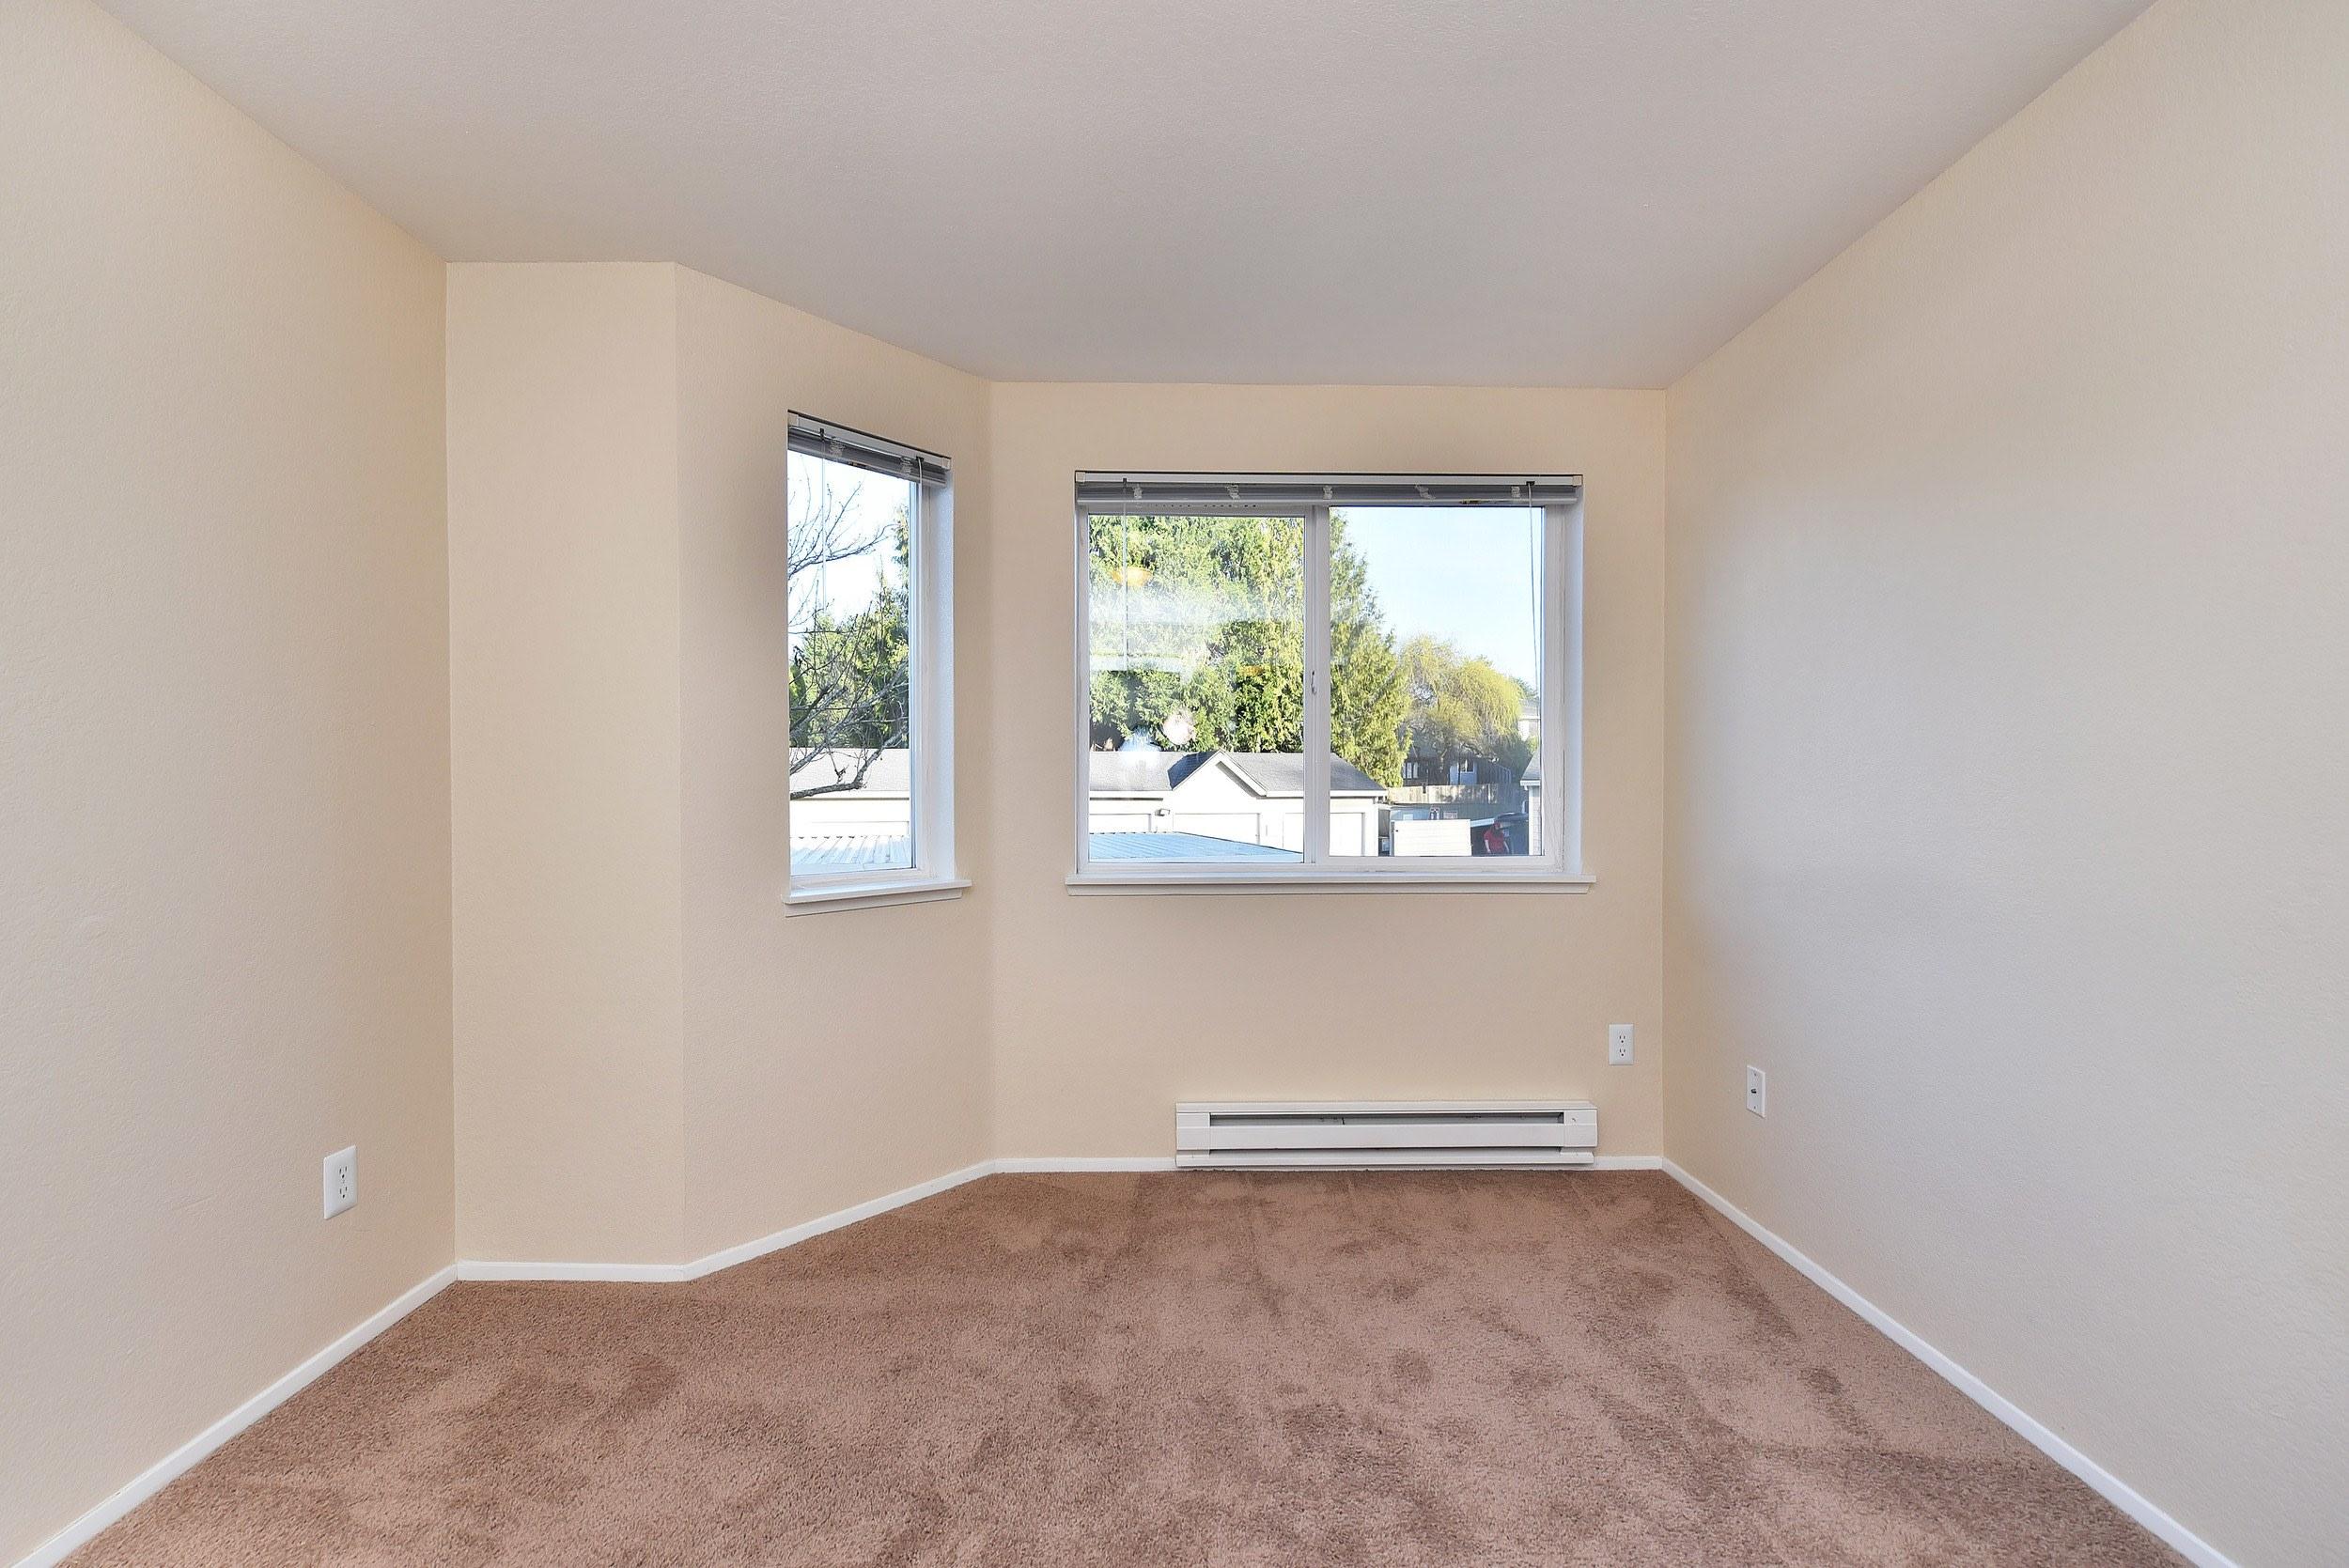 Spacious bedroom at Preserve at Sunnyside Apartments in Clackamas, Oregon